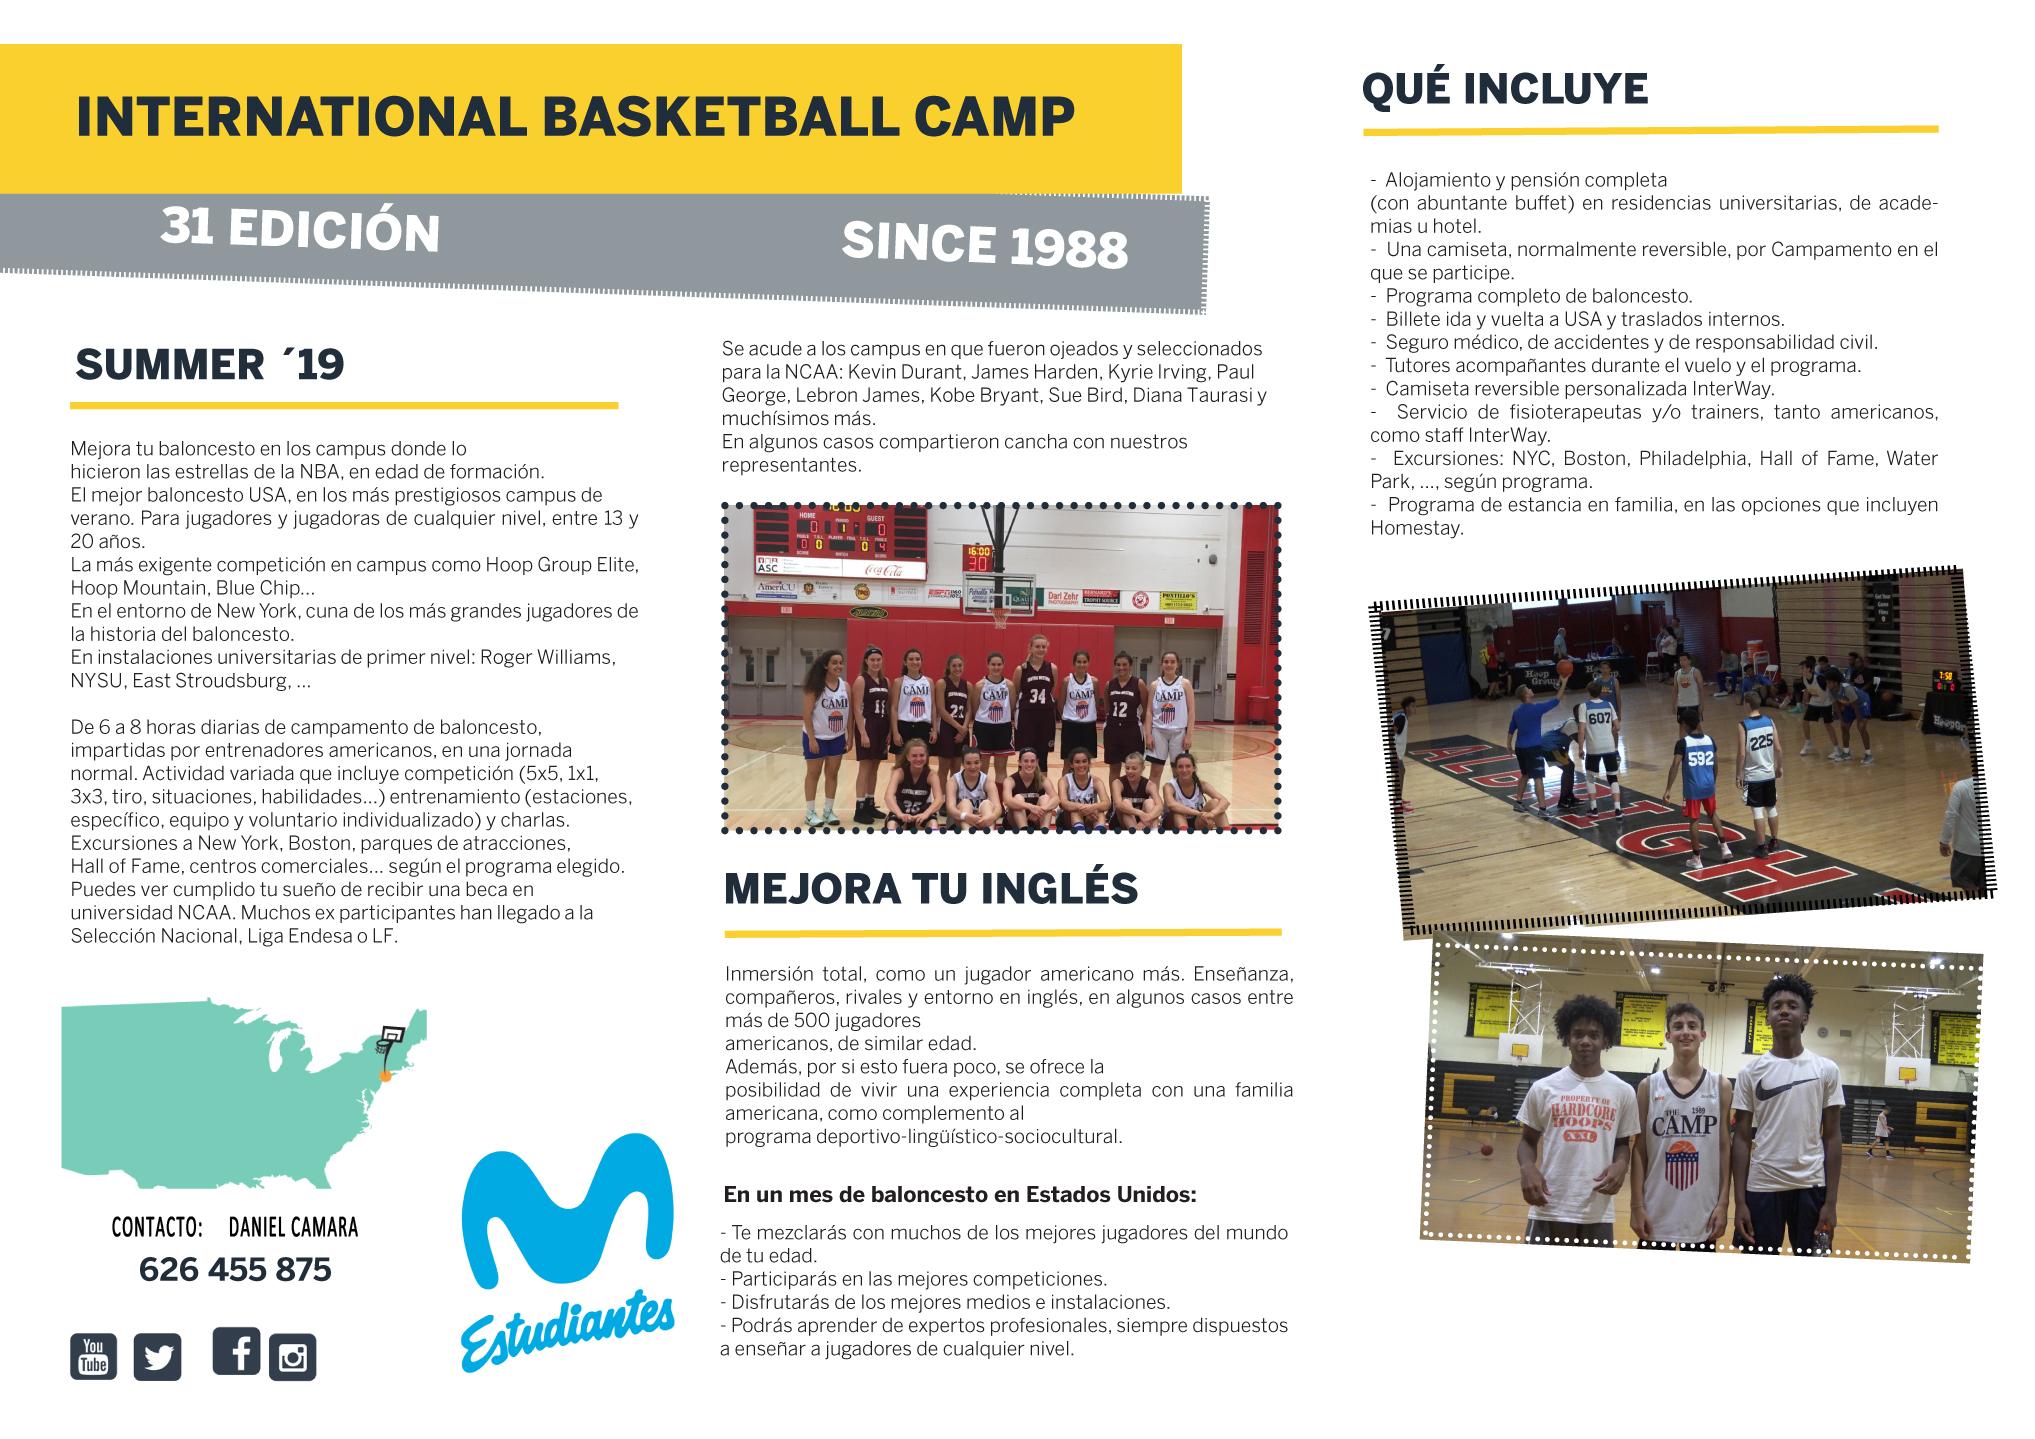 XXXI International Basketball Camp, EEUU